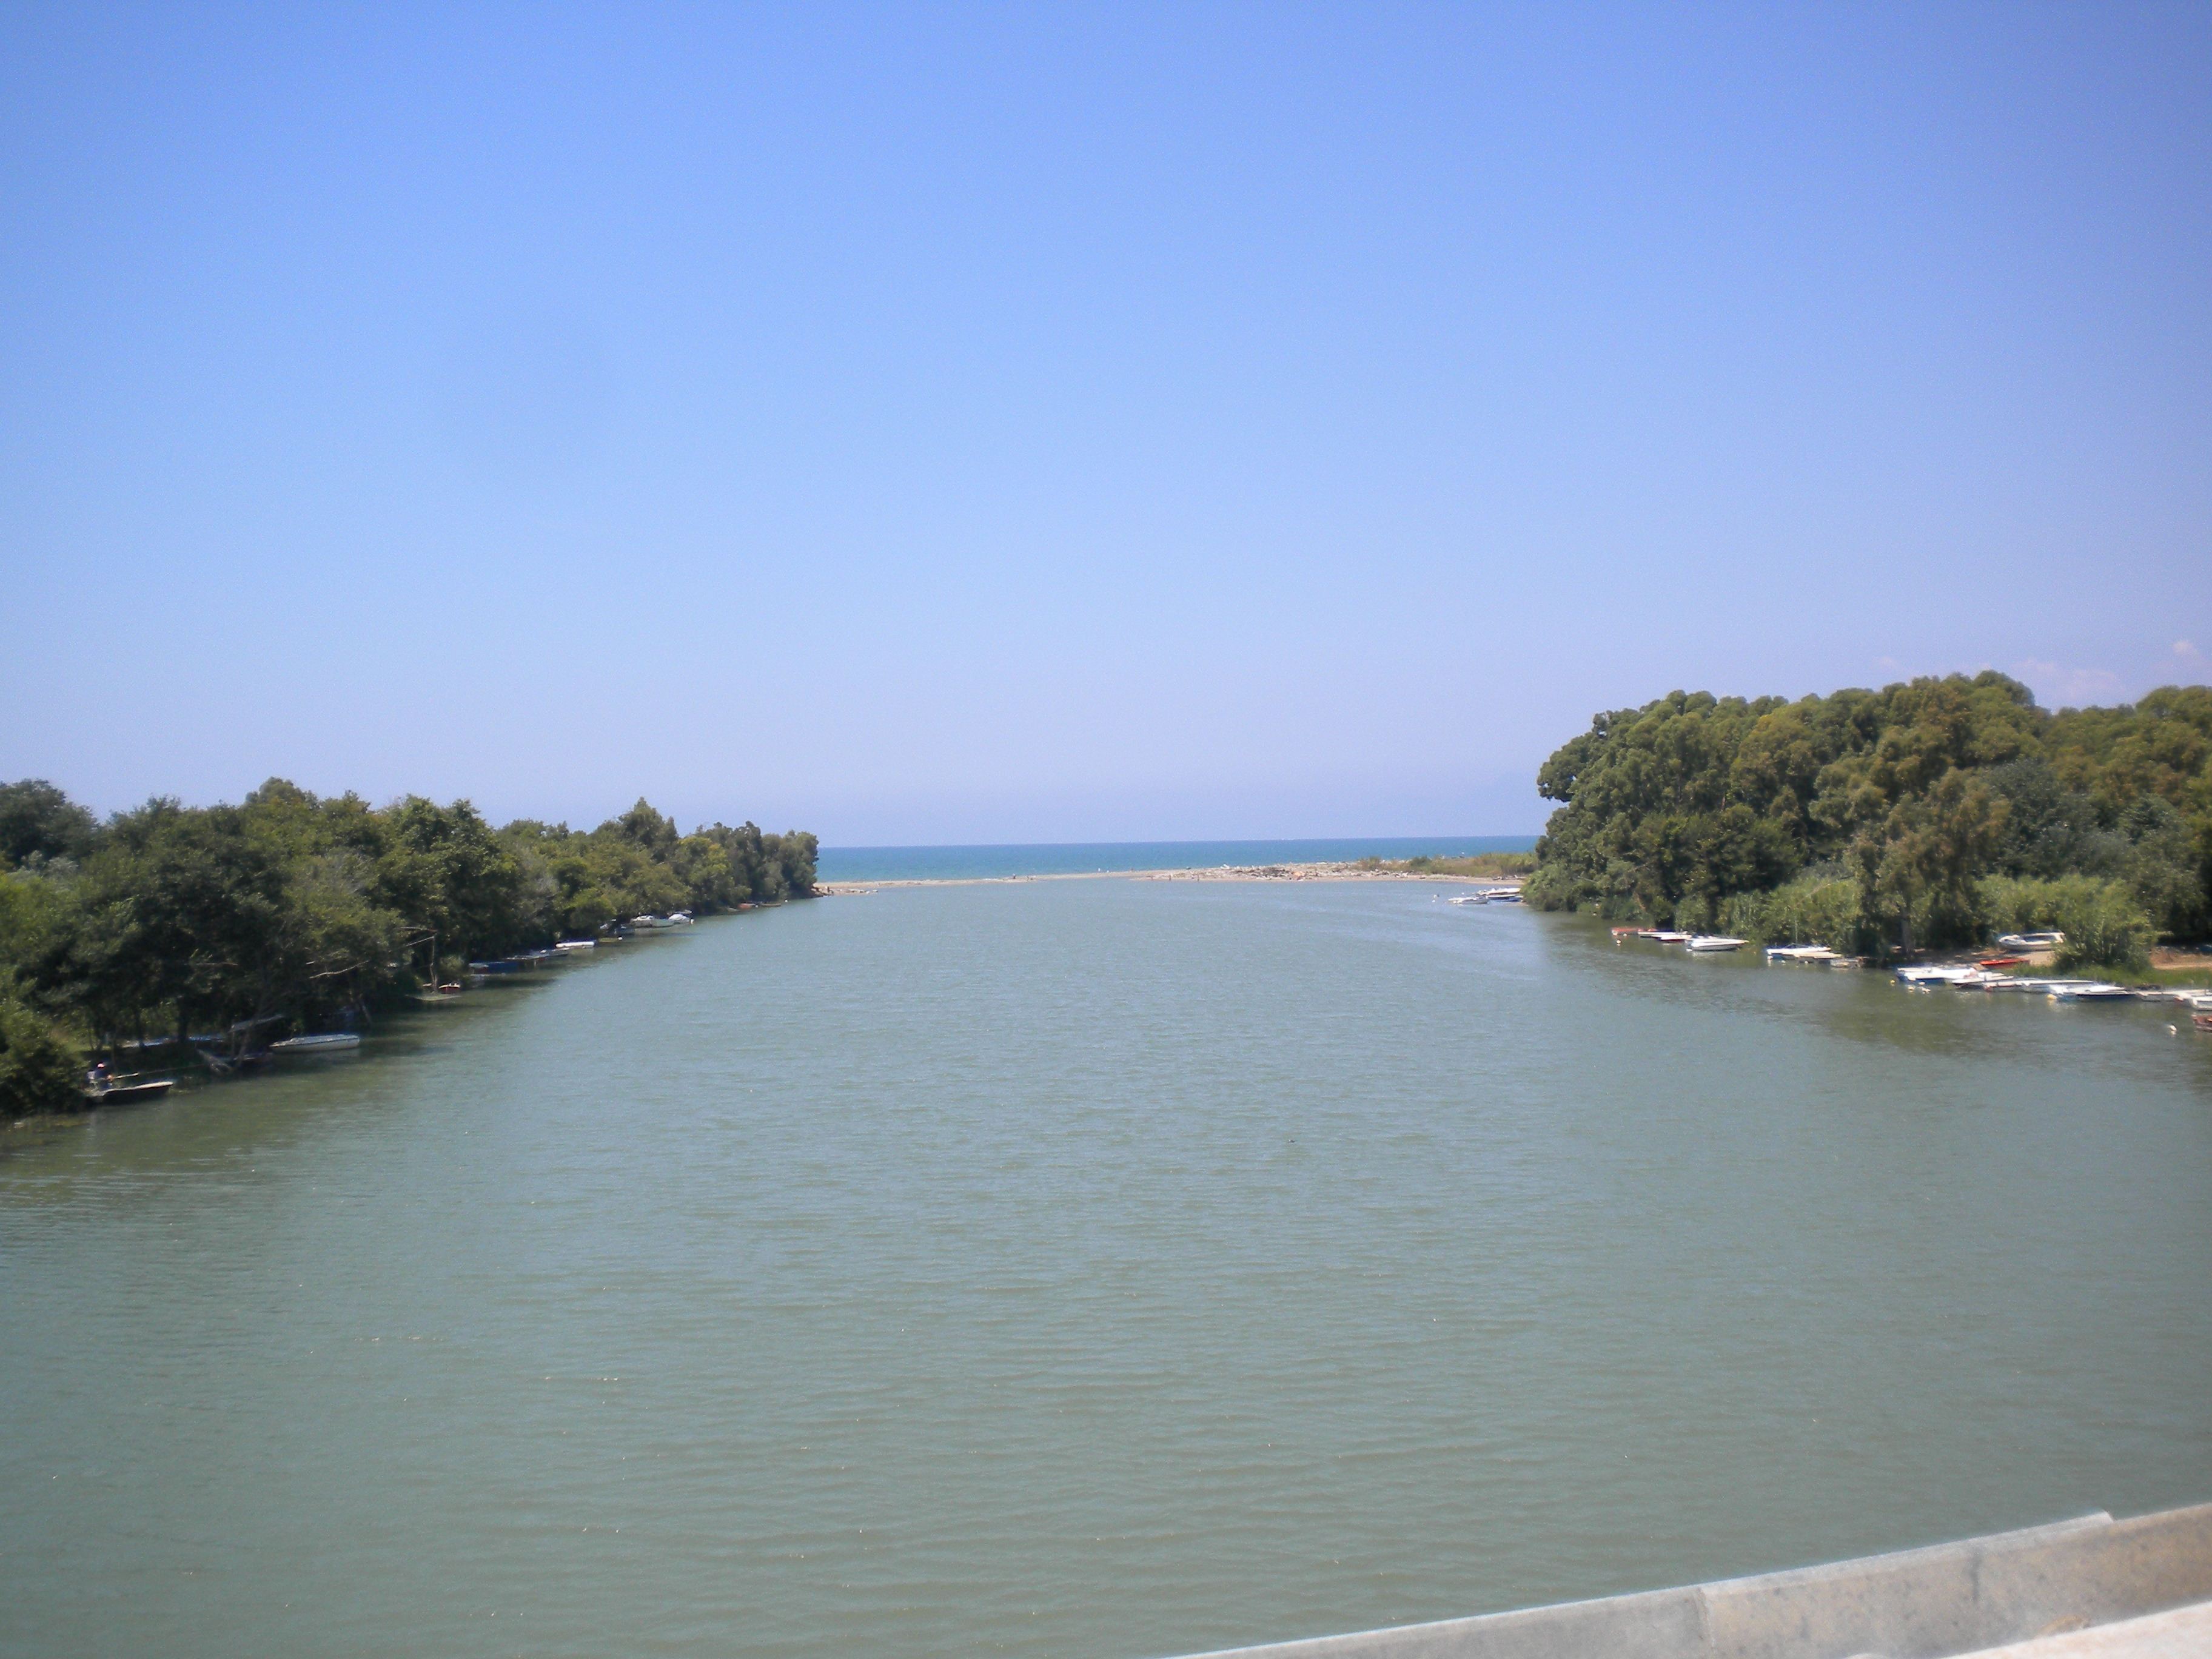 Foce del fiume Sele tra Eboli e Paestum